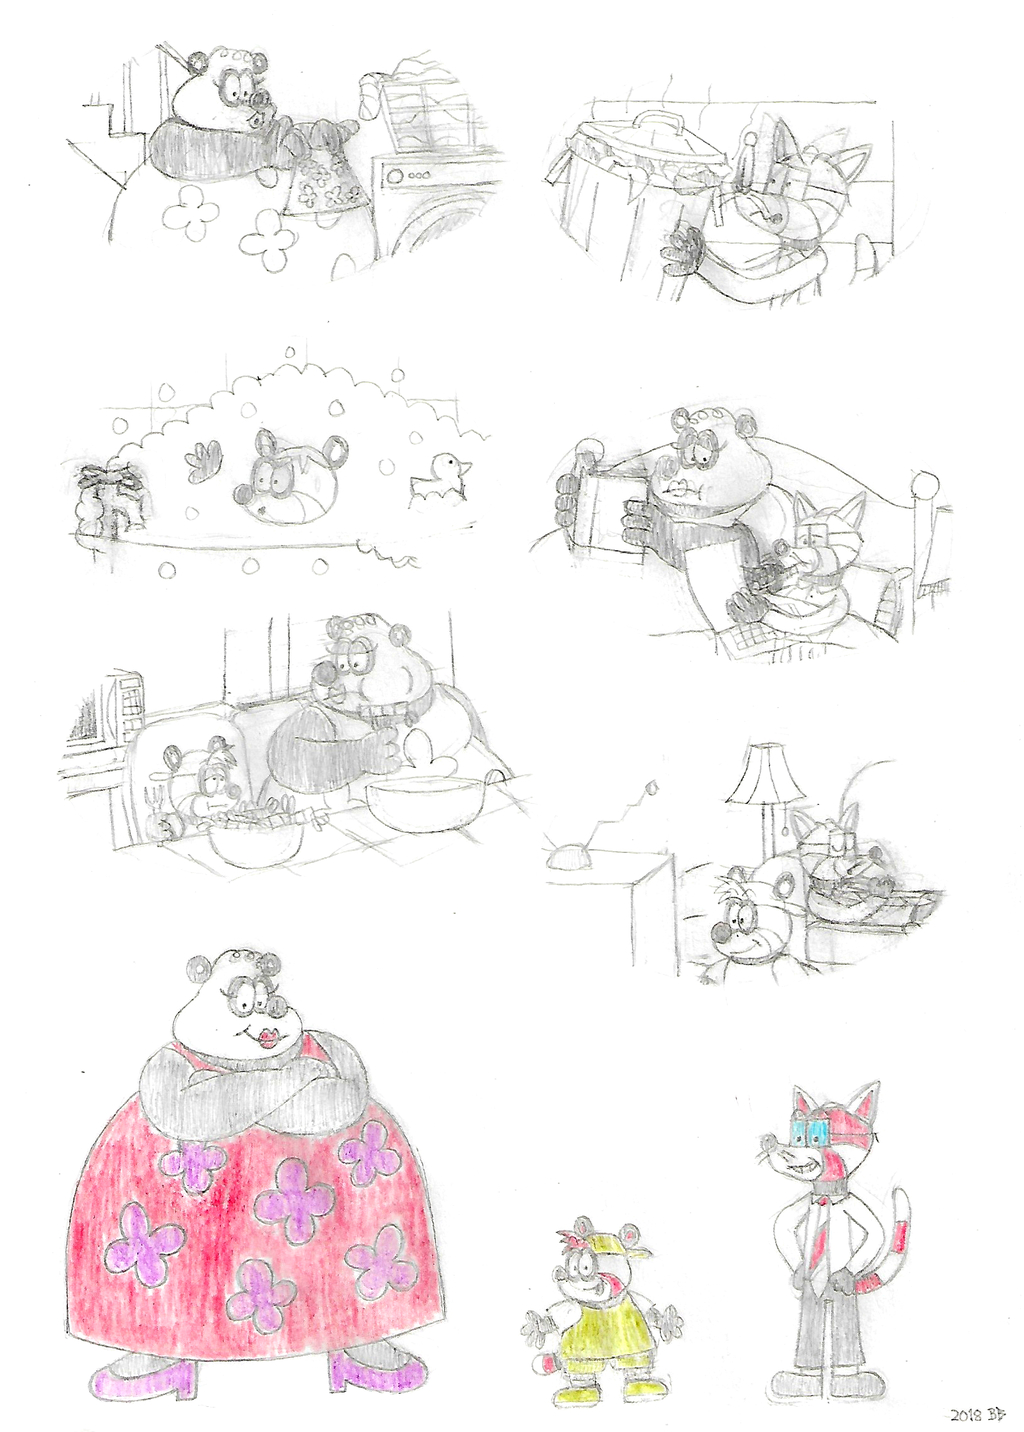 Featured image: Panda Family